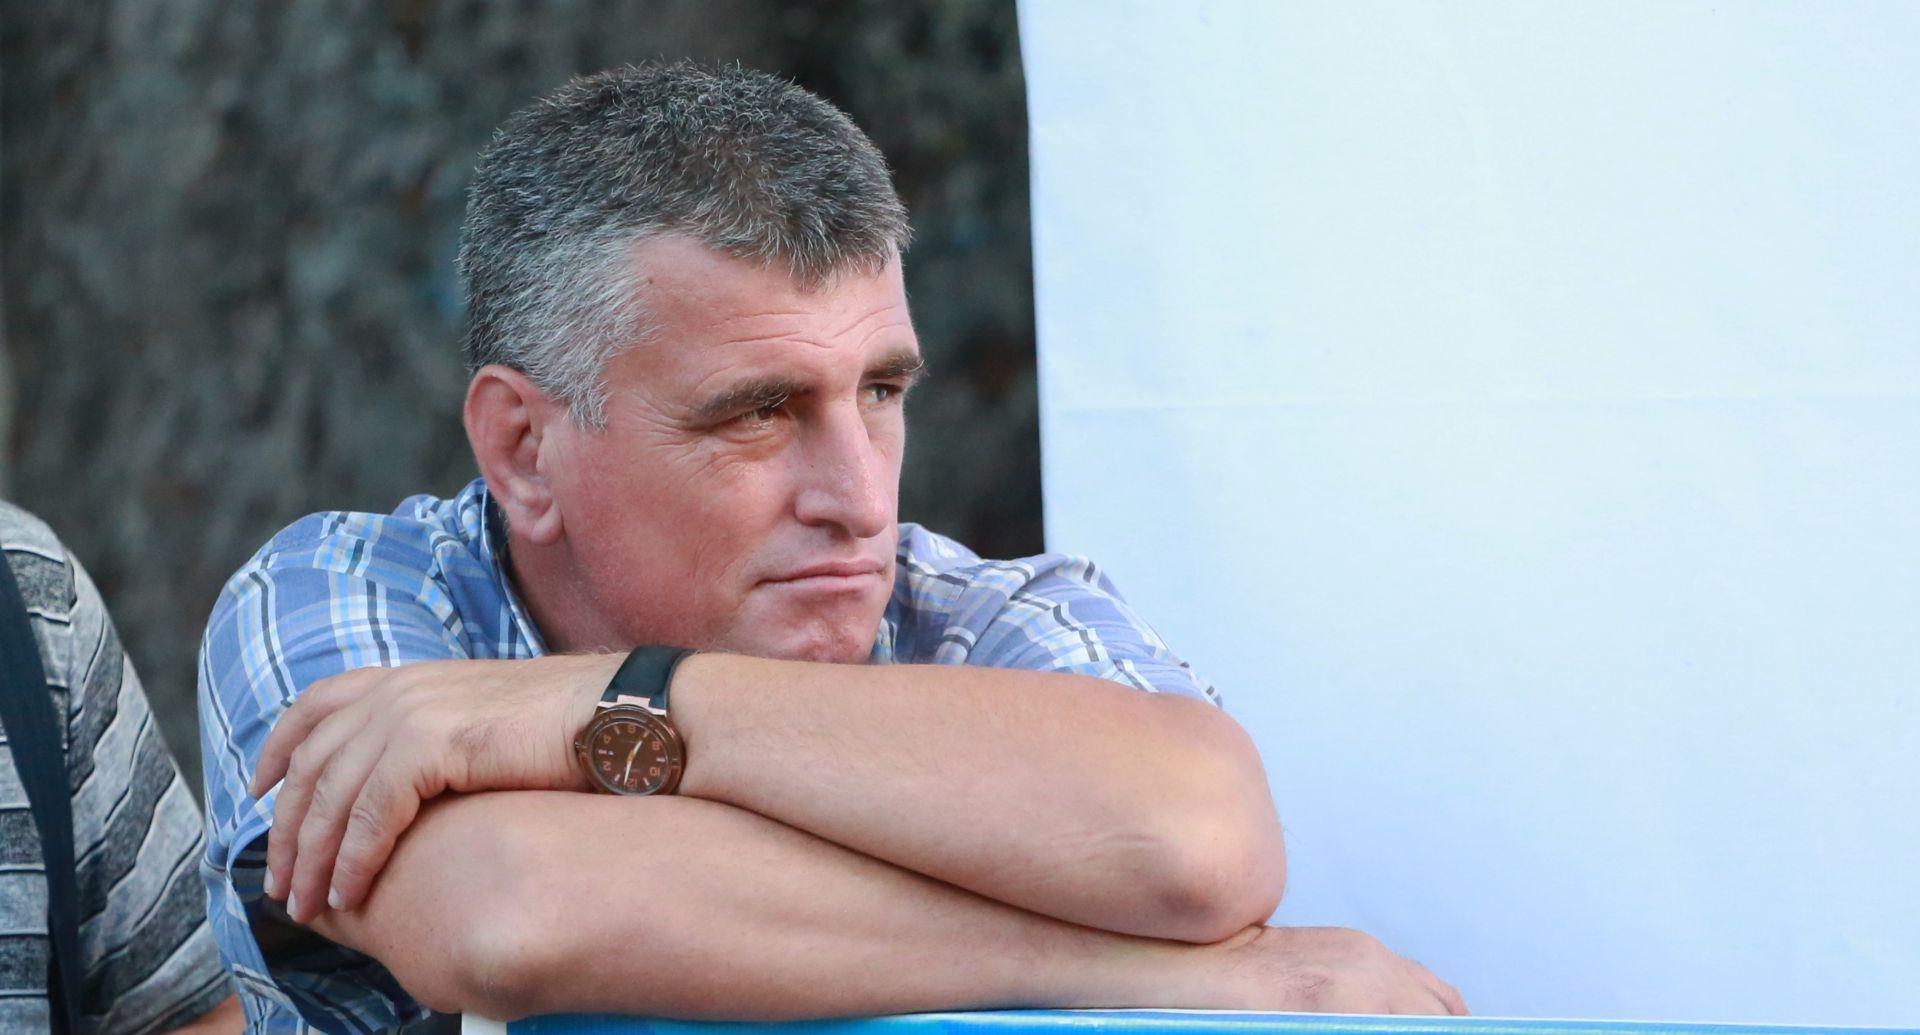 Miro Bulj podnio prijavu protiv Vesne Pusić zbog zlouporabe položaja i ovlasti